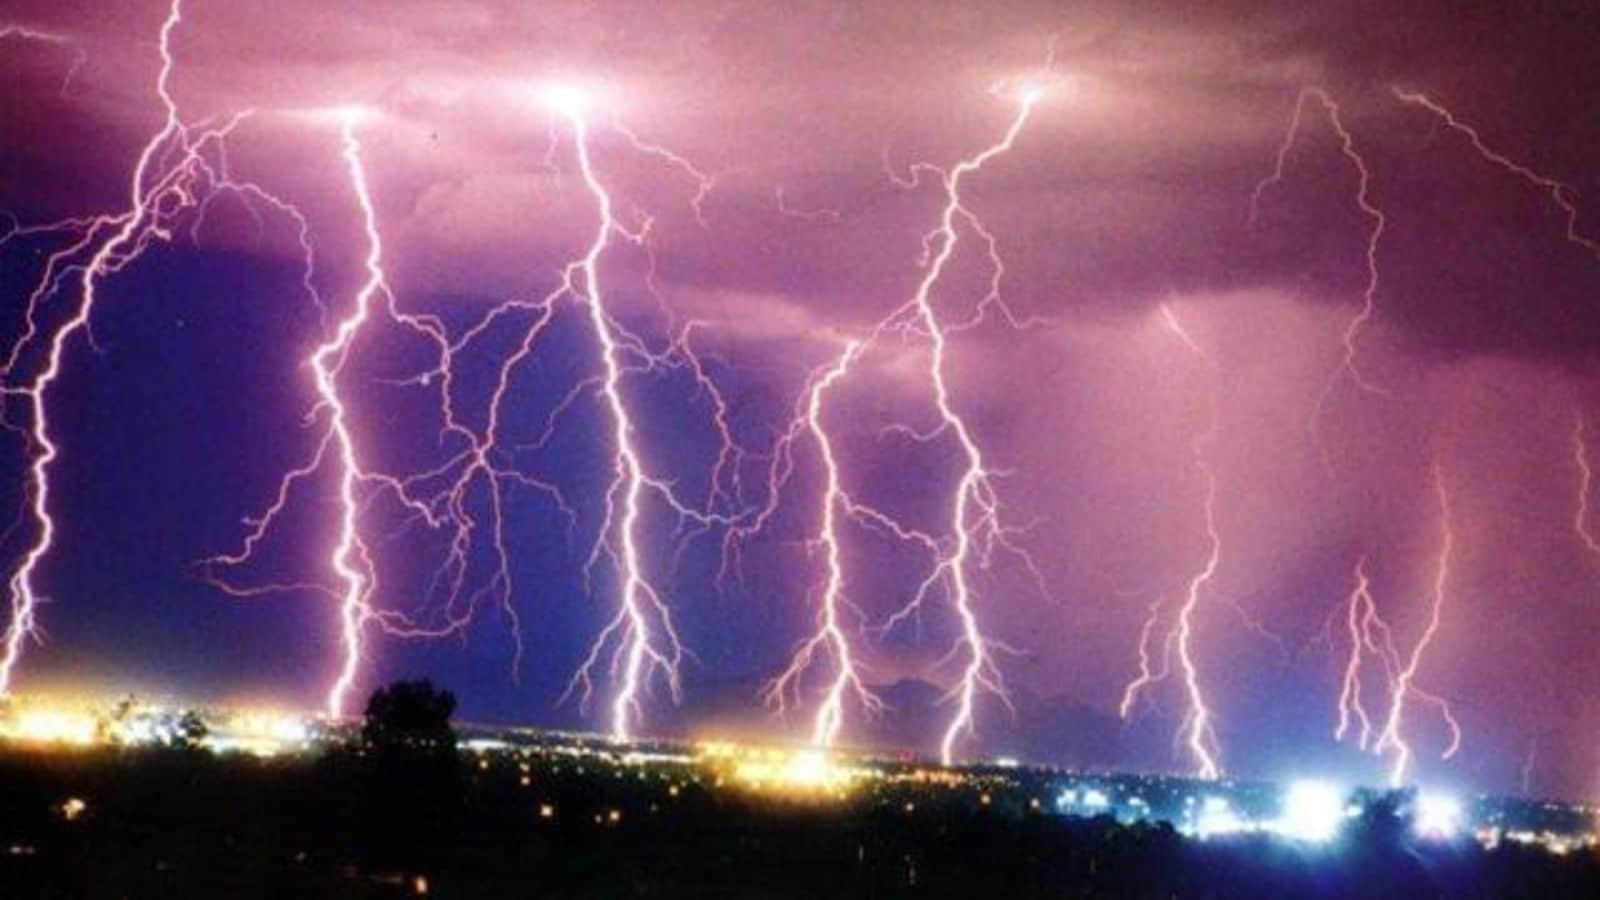 Acinq Successfully Raises 1.7 Million to Increase Lightning Network Development